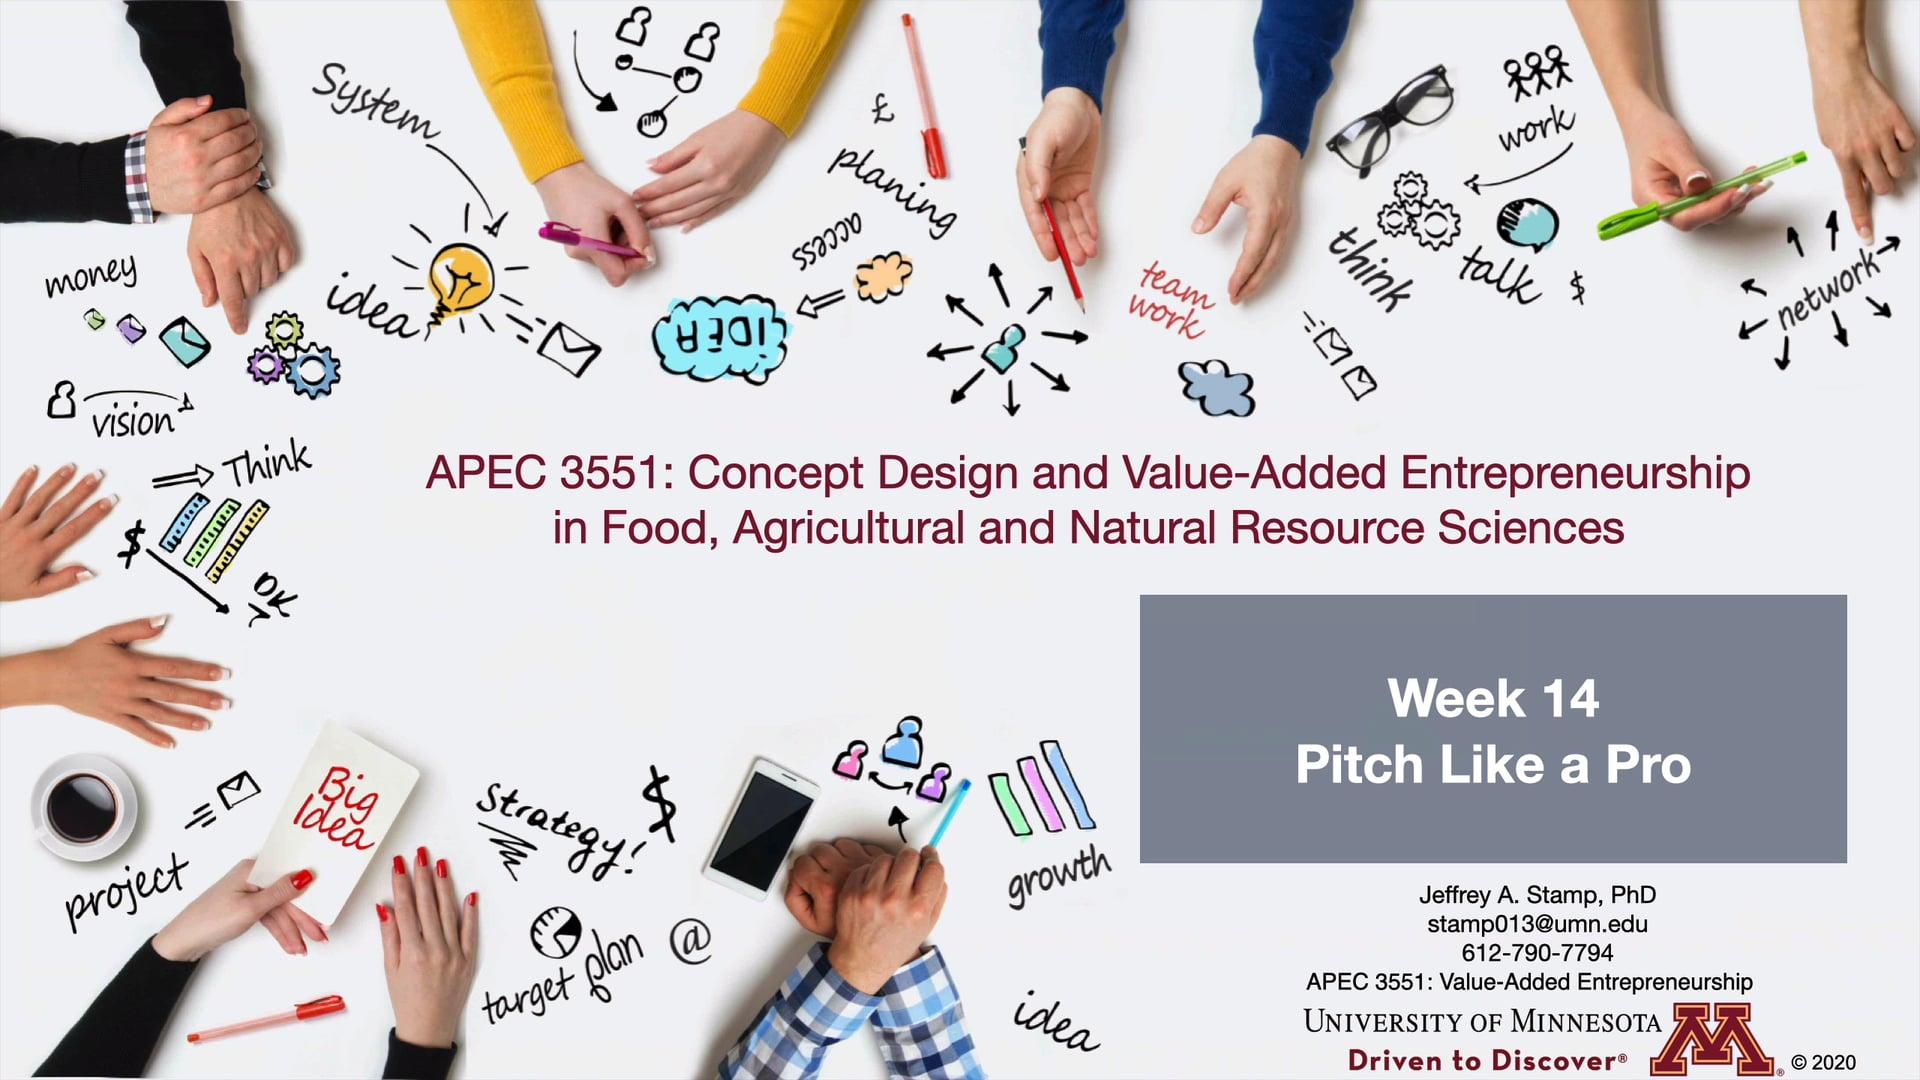 APEC 3551 F20 Week 14 - Pitch Like a Pro